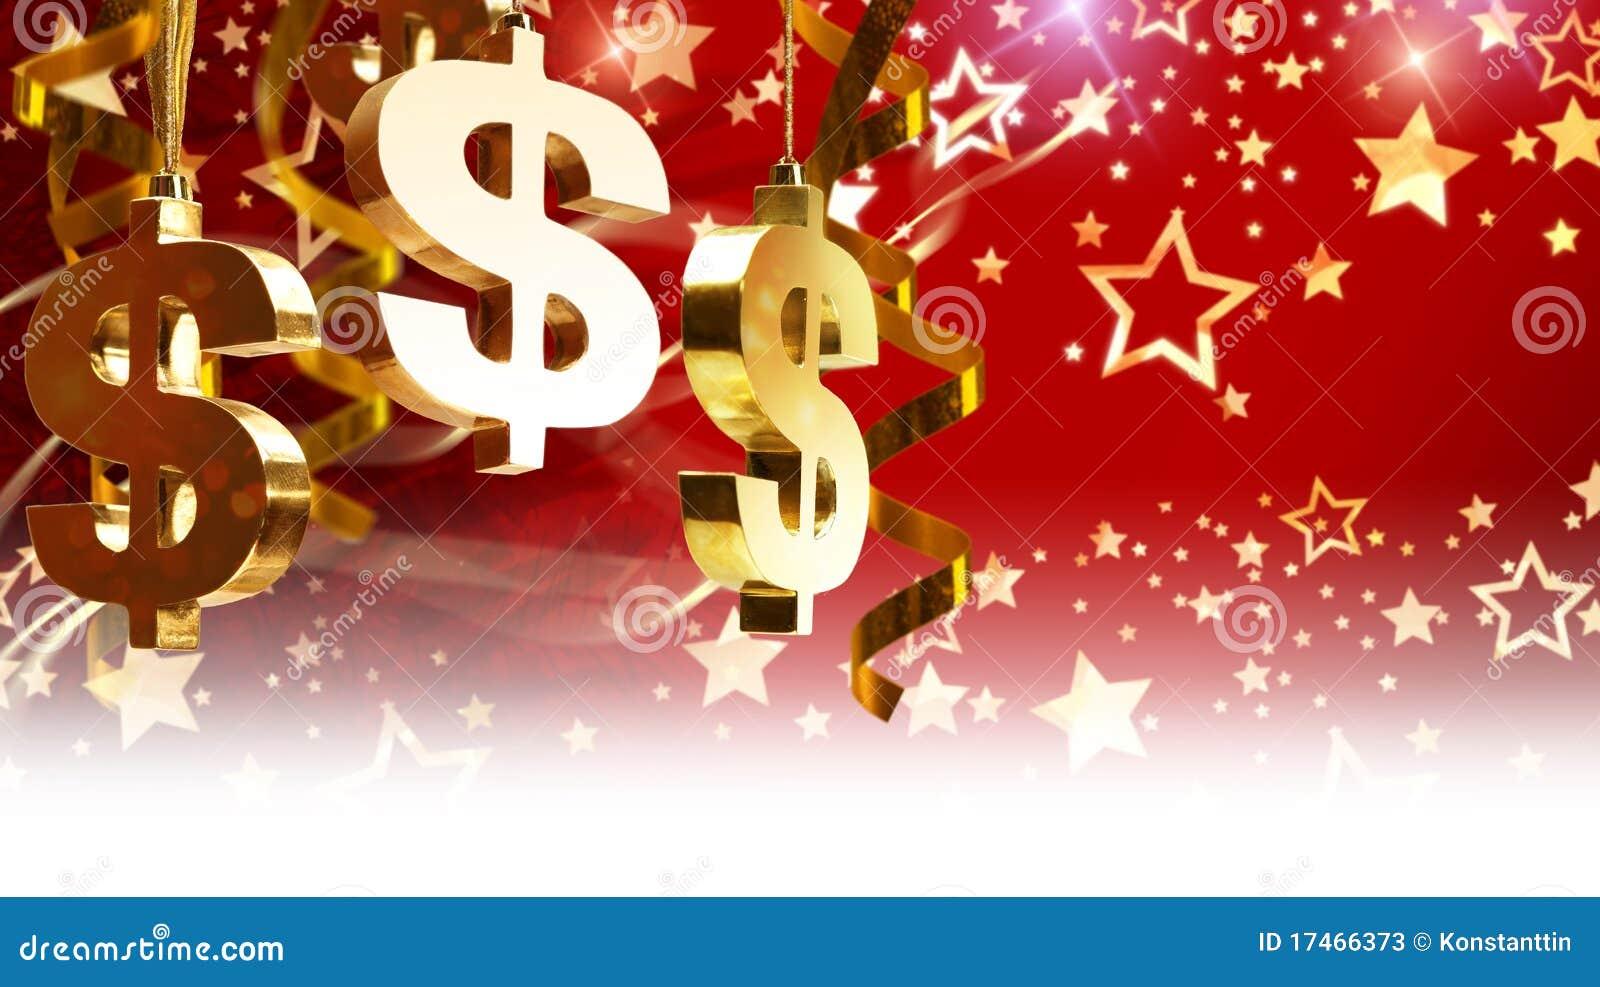 Christmas Greetings For Business Stock Image Image Of